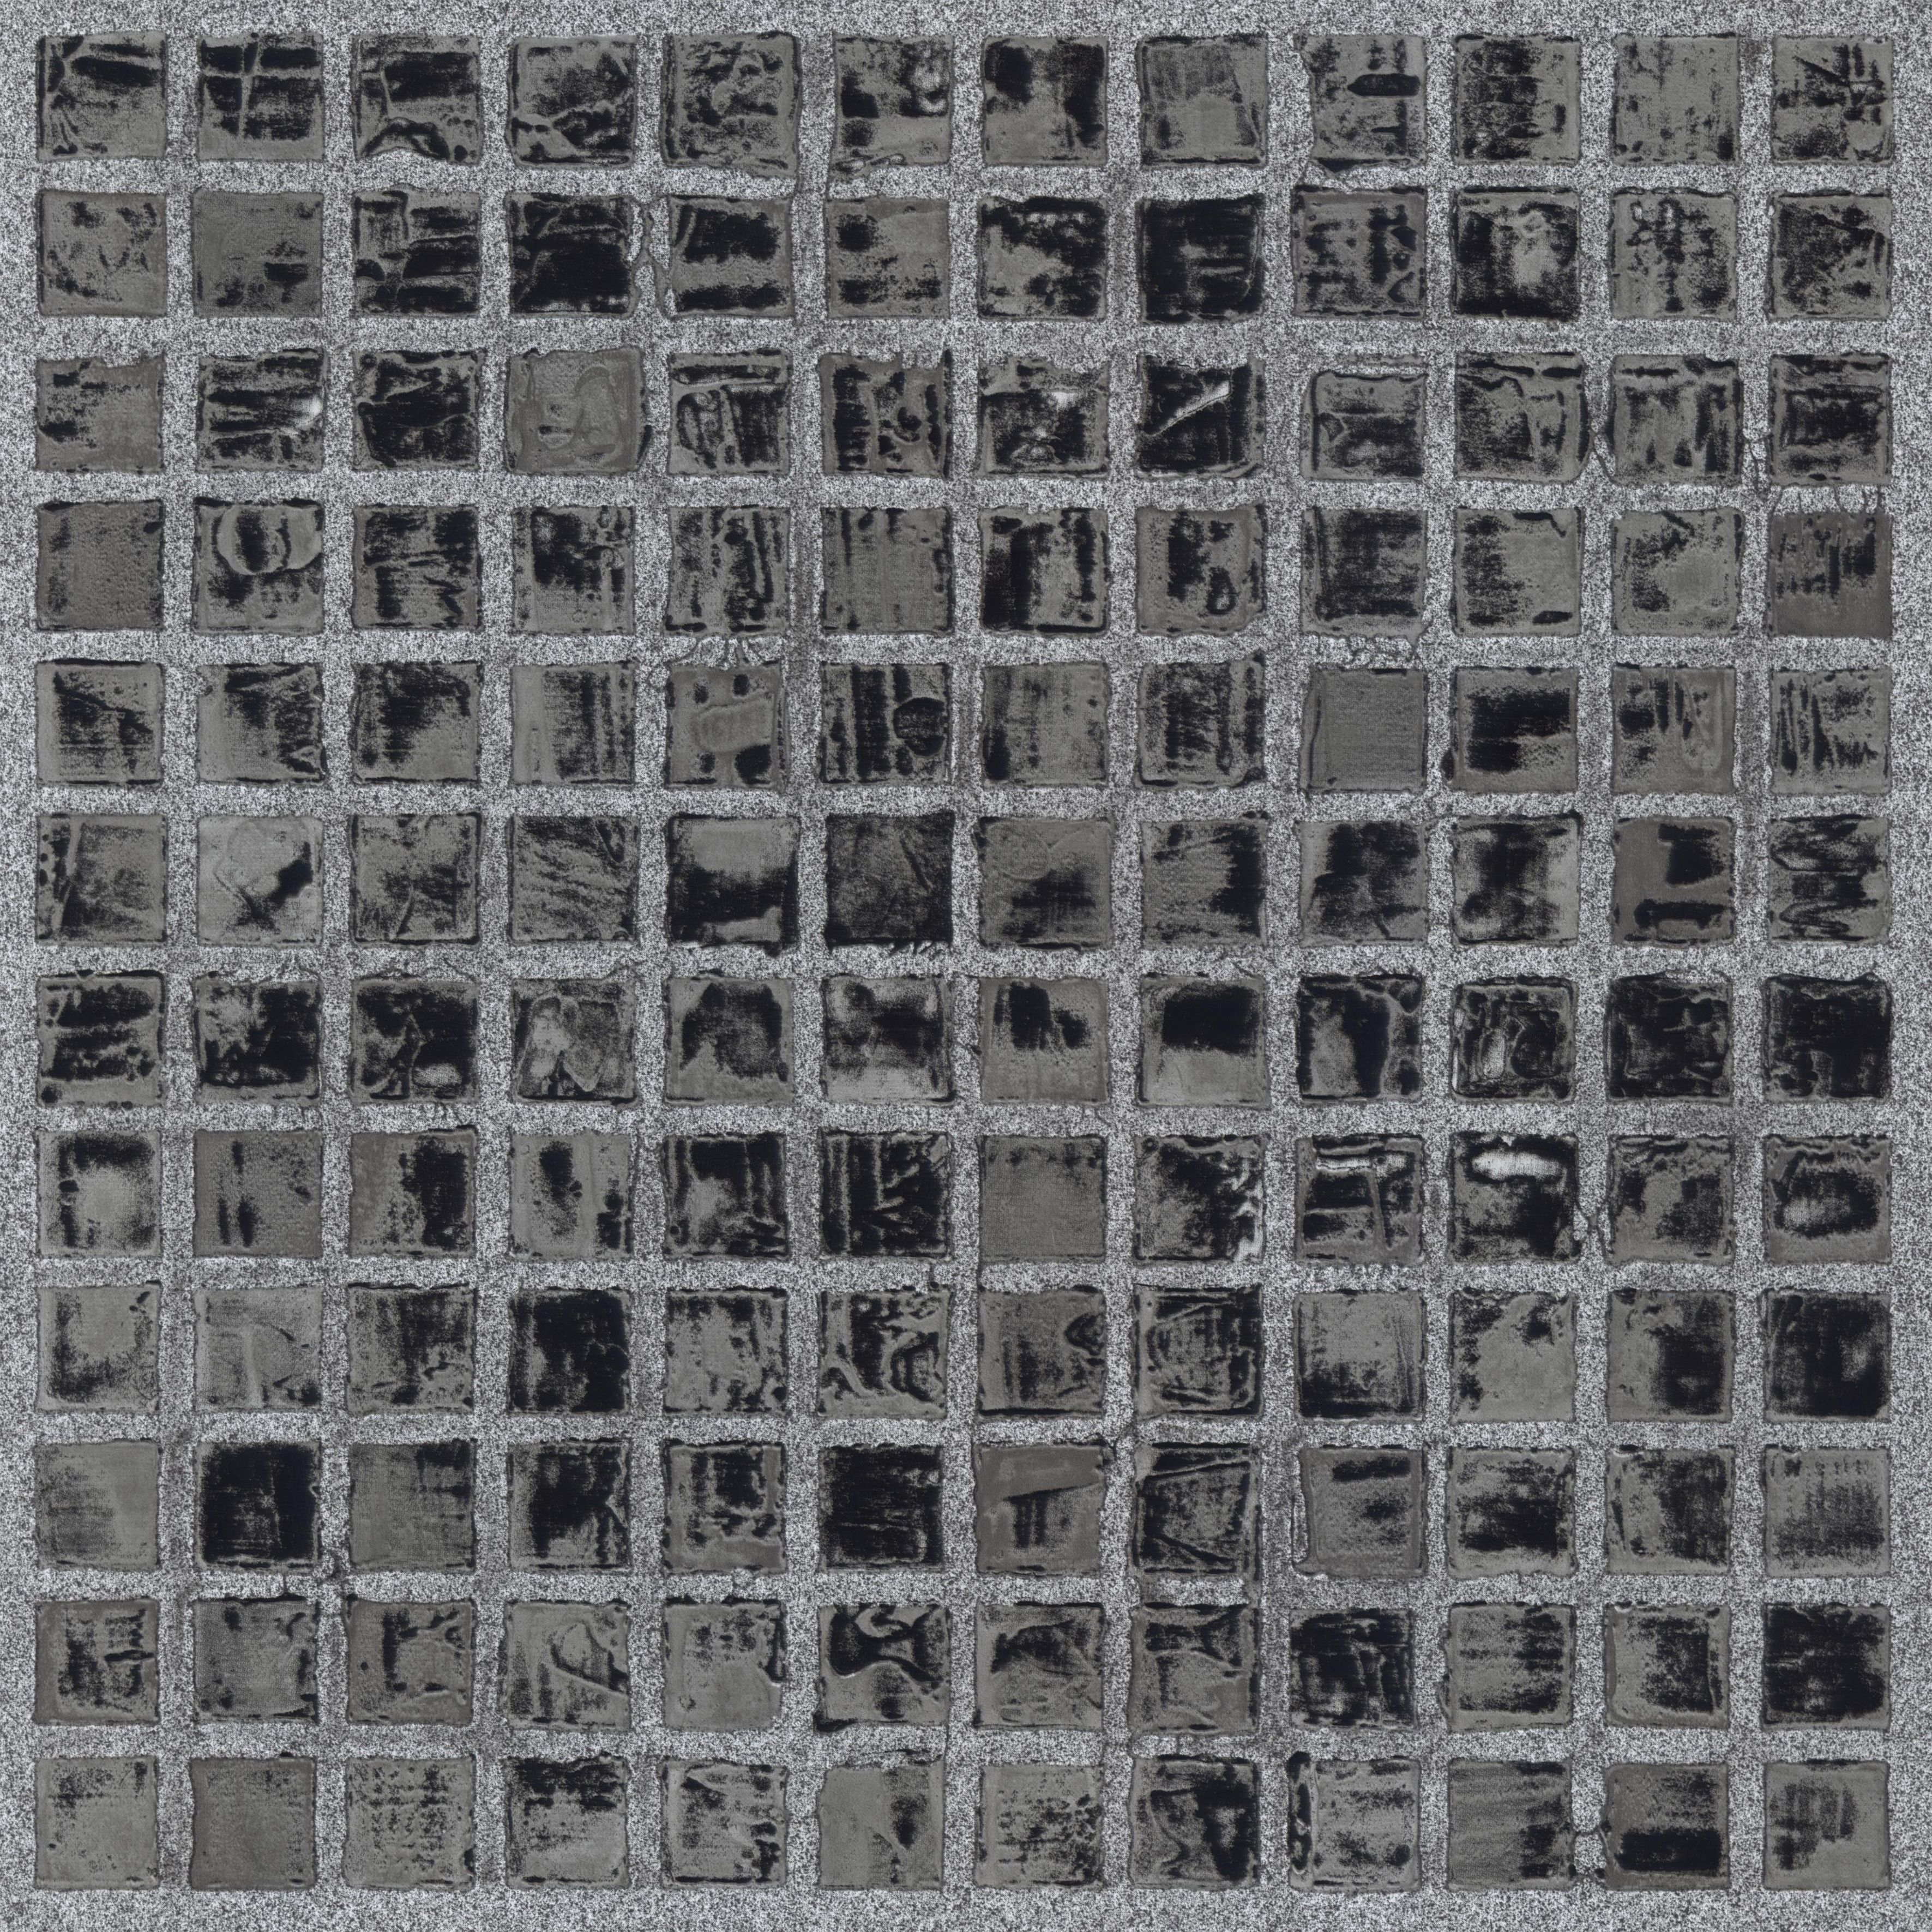 Black Mosaic Effect Self Adhesive Vinyl Tile 1.02 M² Pack